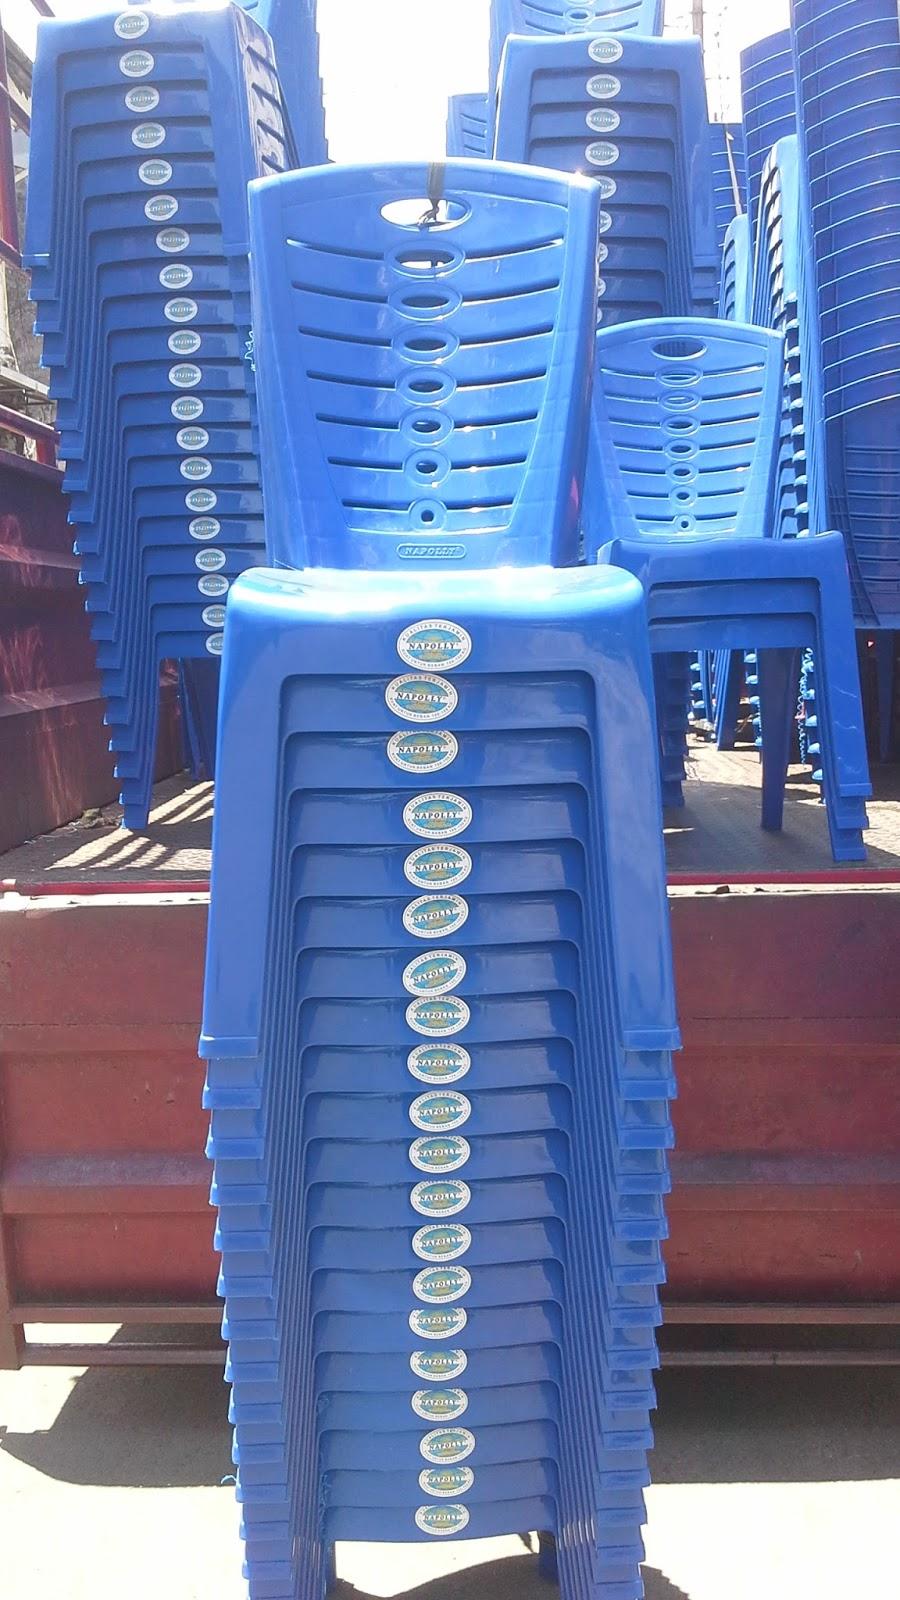 880 Koleksi Gambar Kursi Plastik Biru Terbaru